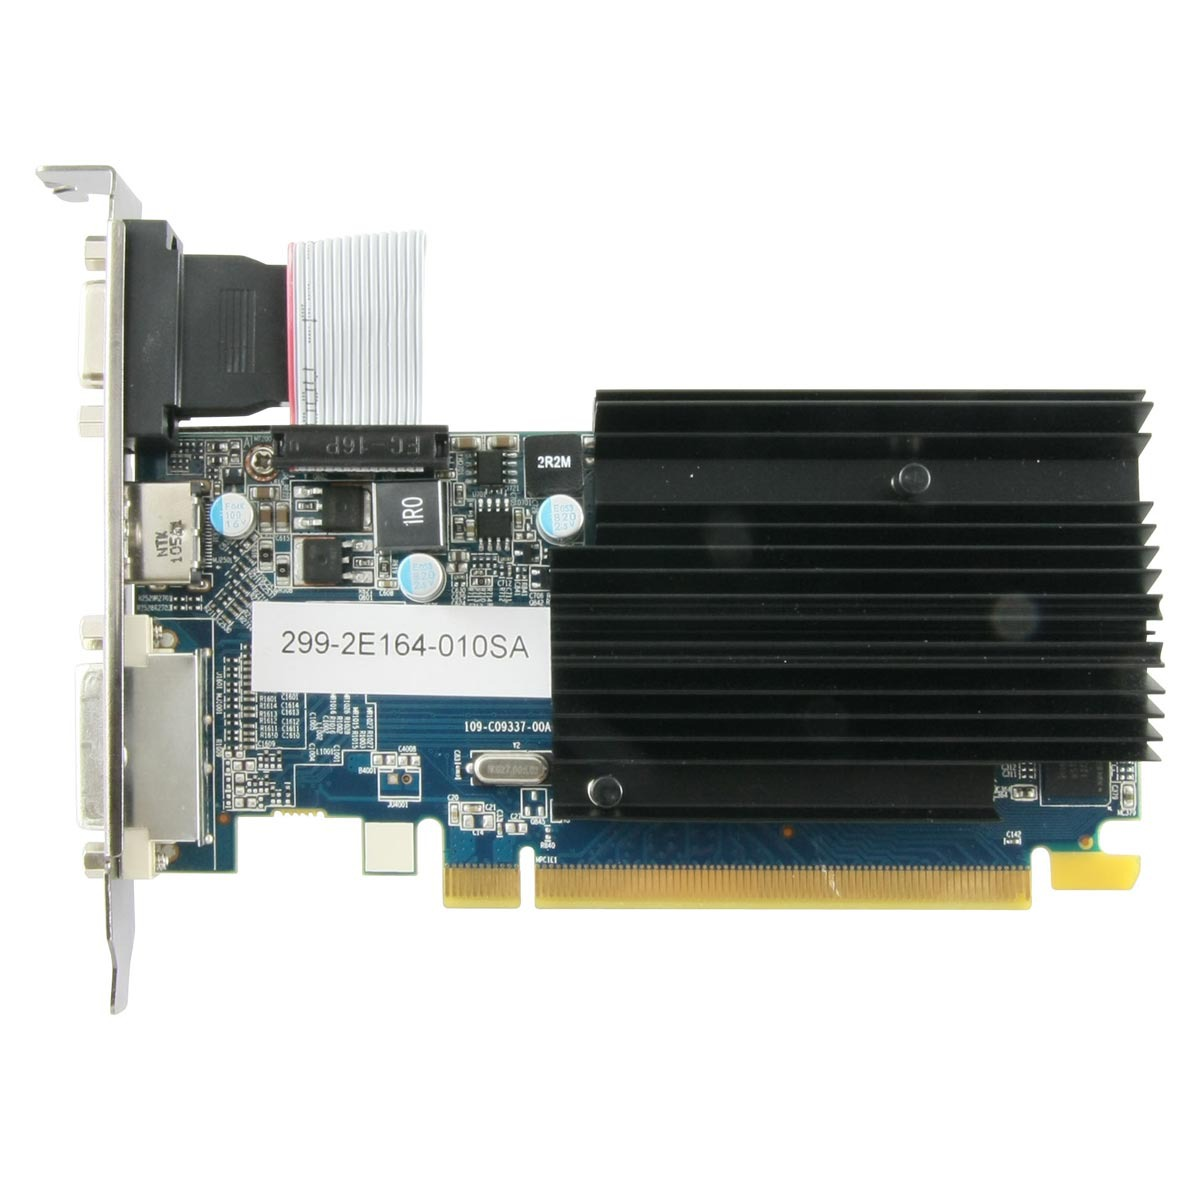 Carte graphique Sapphire Radeon HD 6450 1 GB DDR3 Sapphire Radeon HD 6450 1 Go - 1 Go HDMI/DVI - PCI Express (AMD Radeon HD 6450)